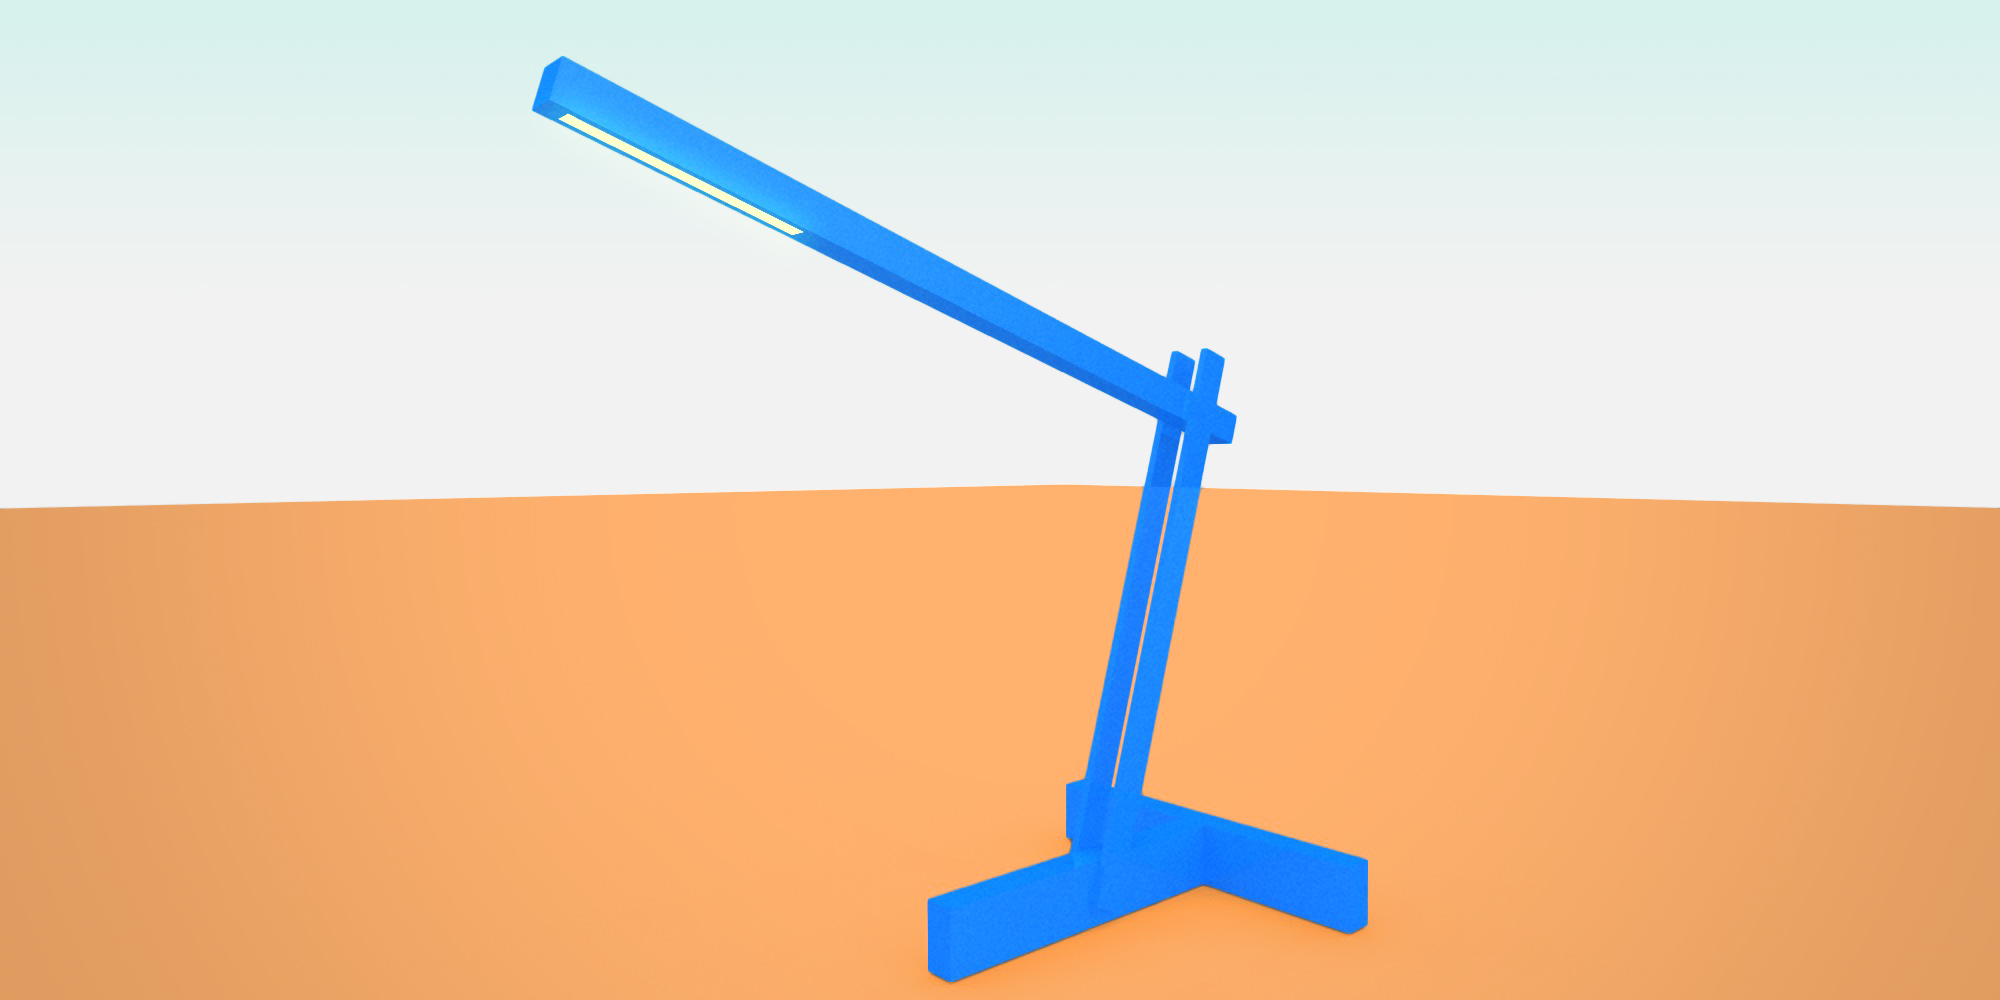 solarlamp rendering